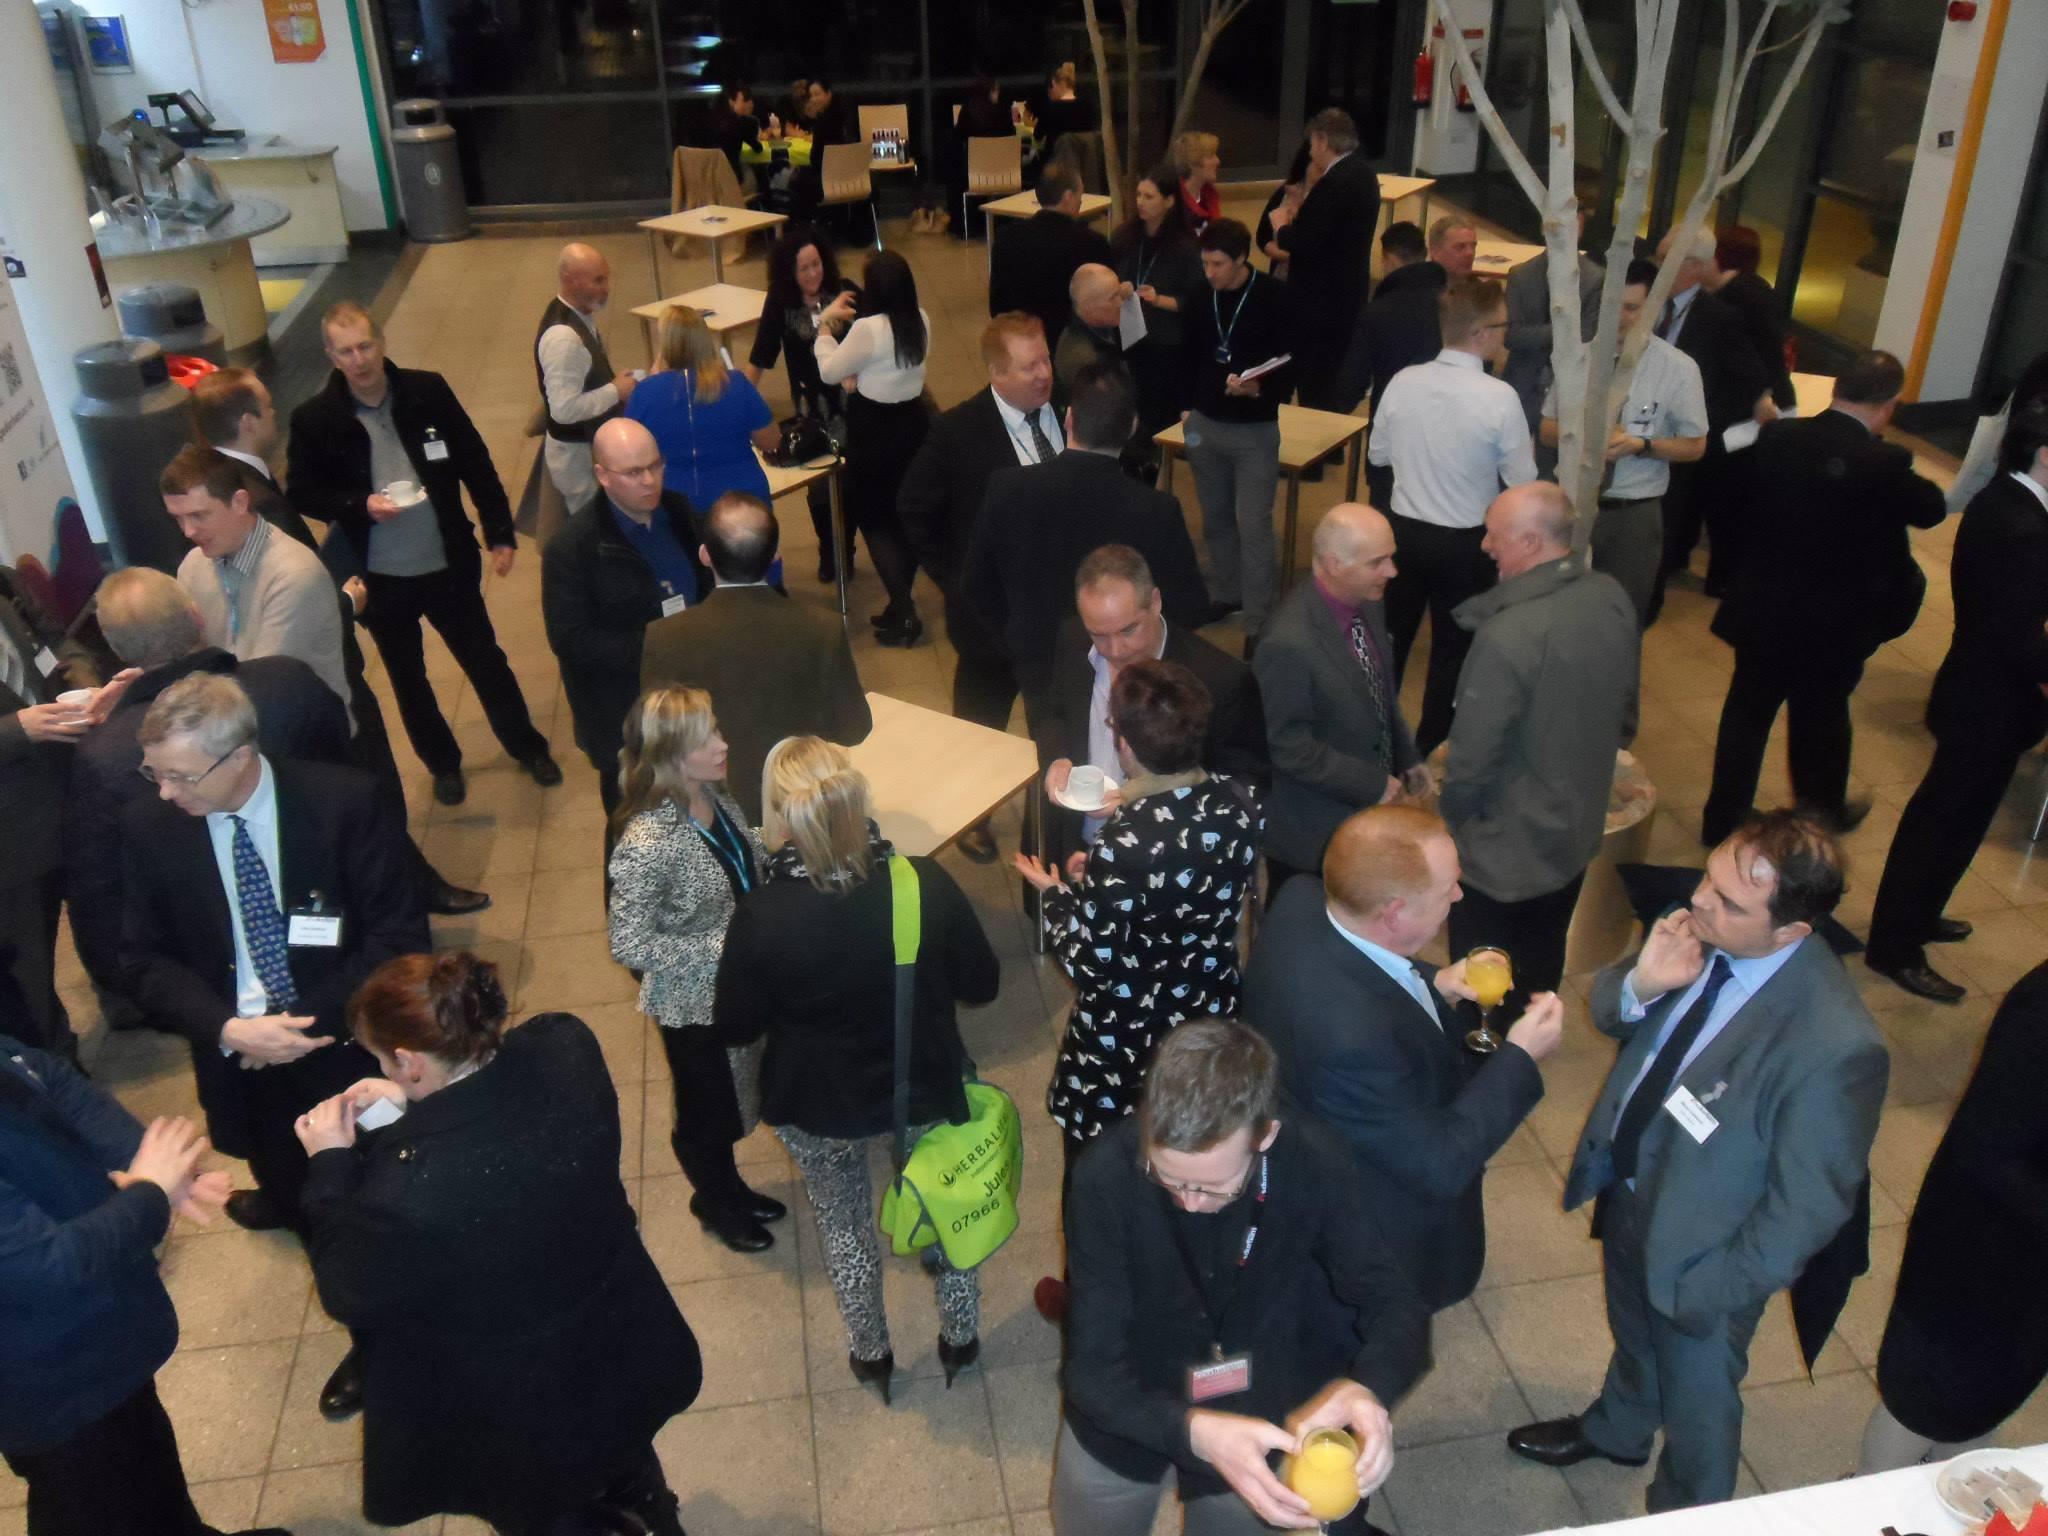 Durham Business Club event at New College Durham